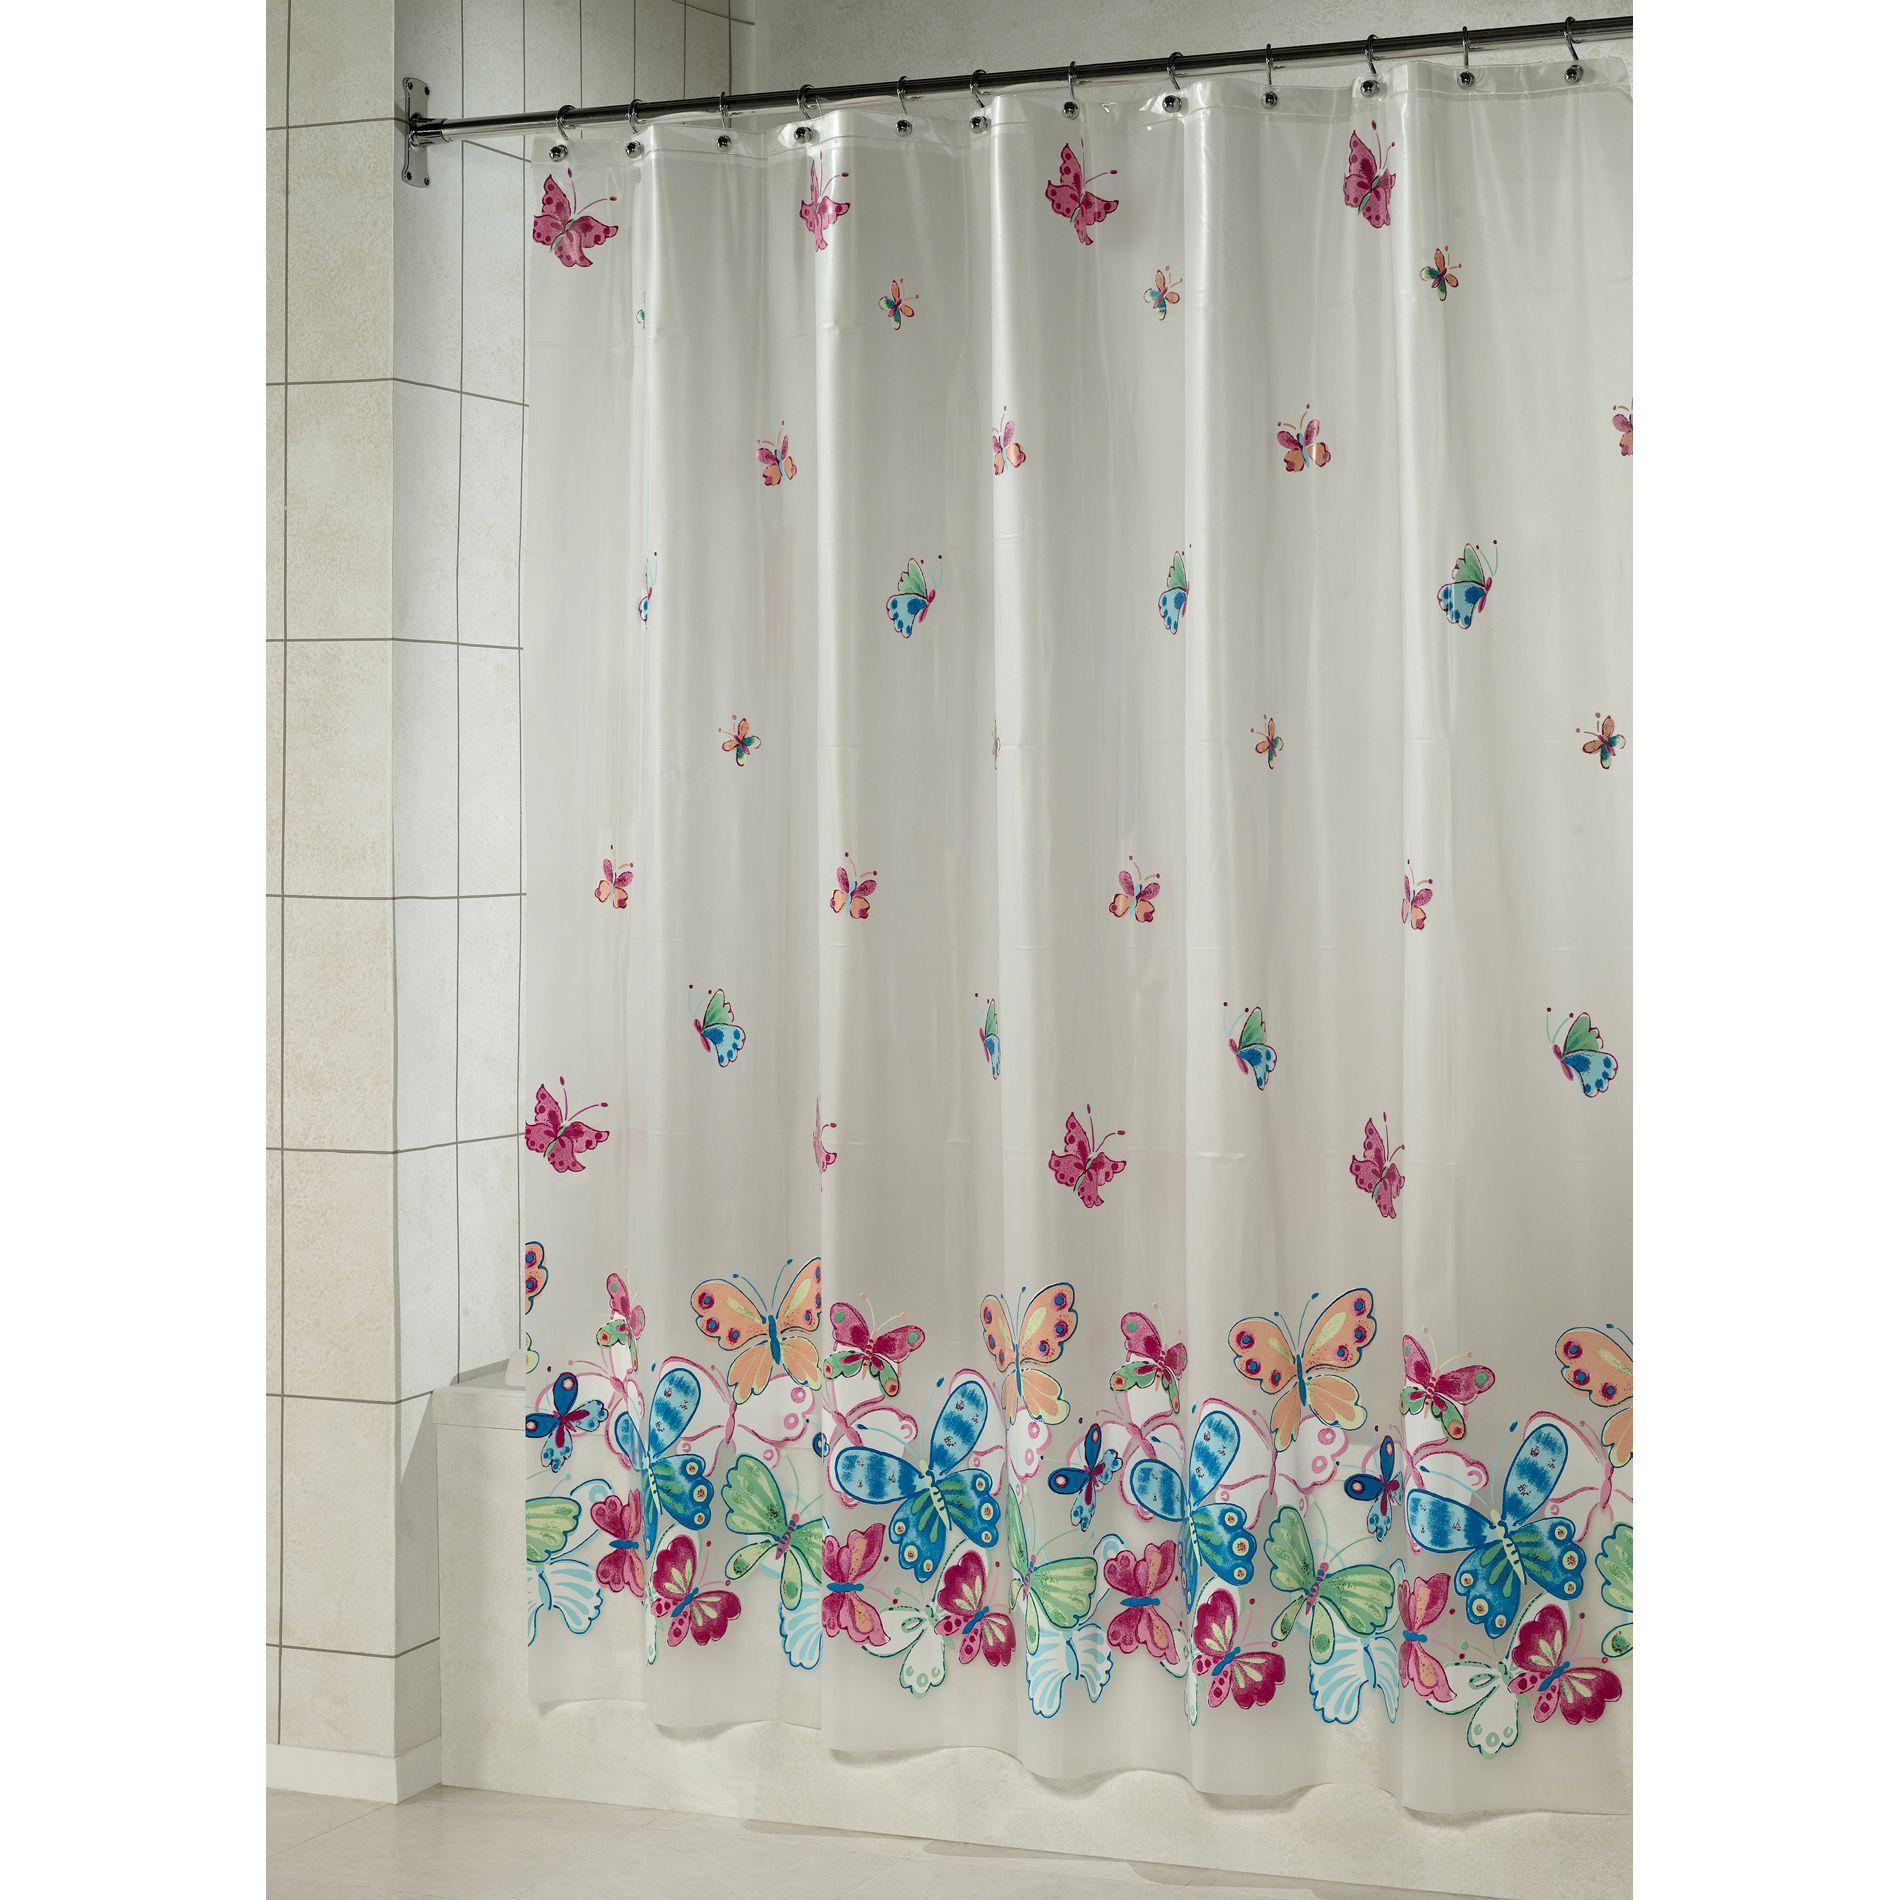 Essential Home Shower Curtain Butterfly Border Vinyl PEVA